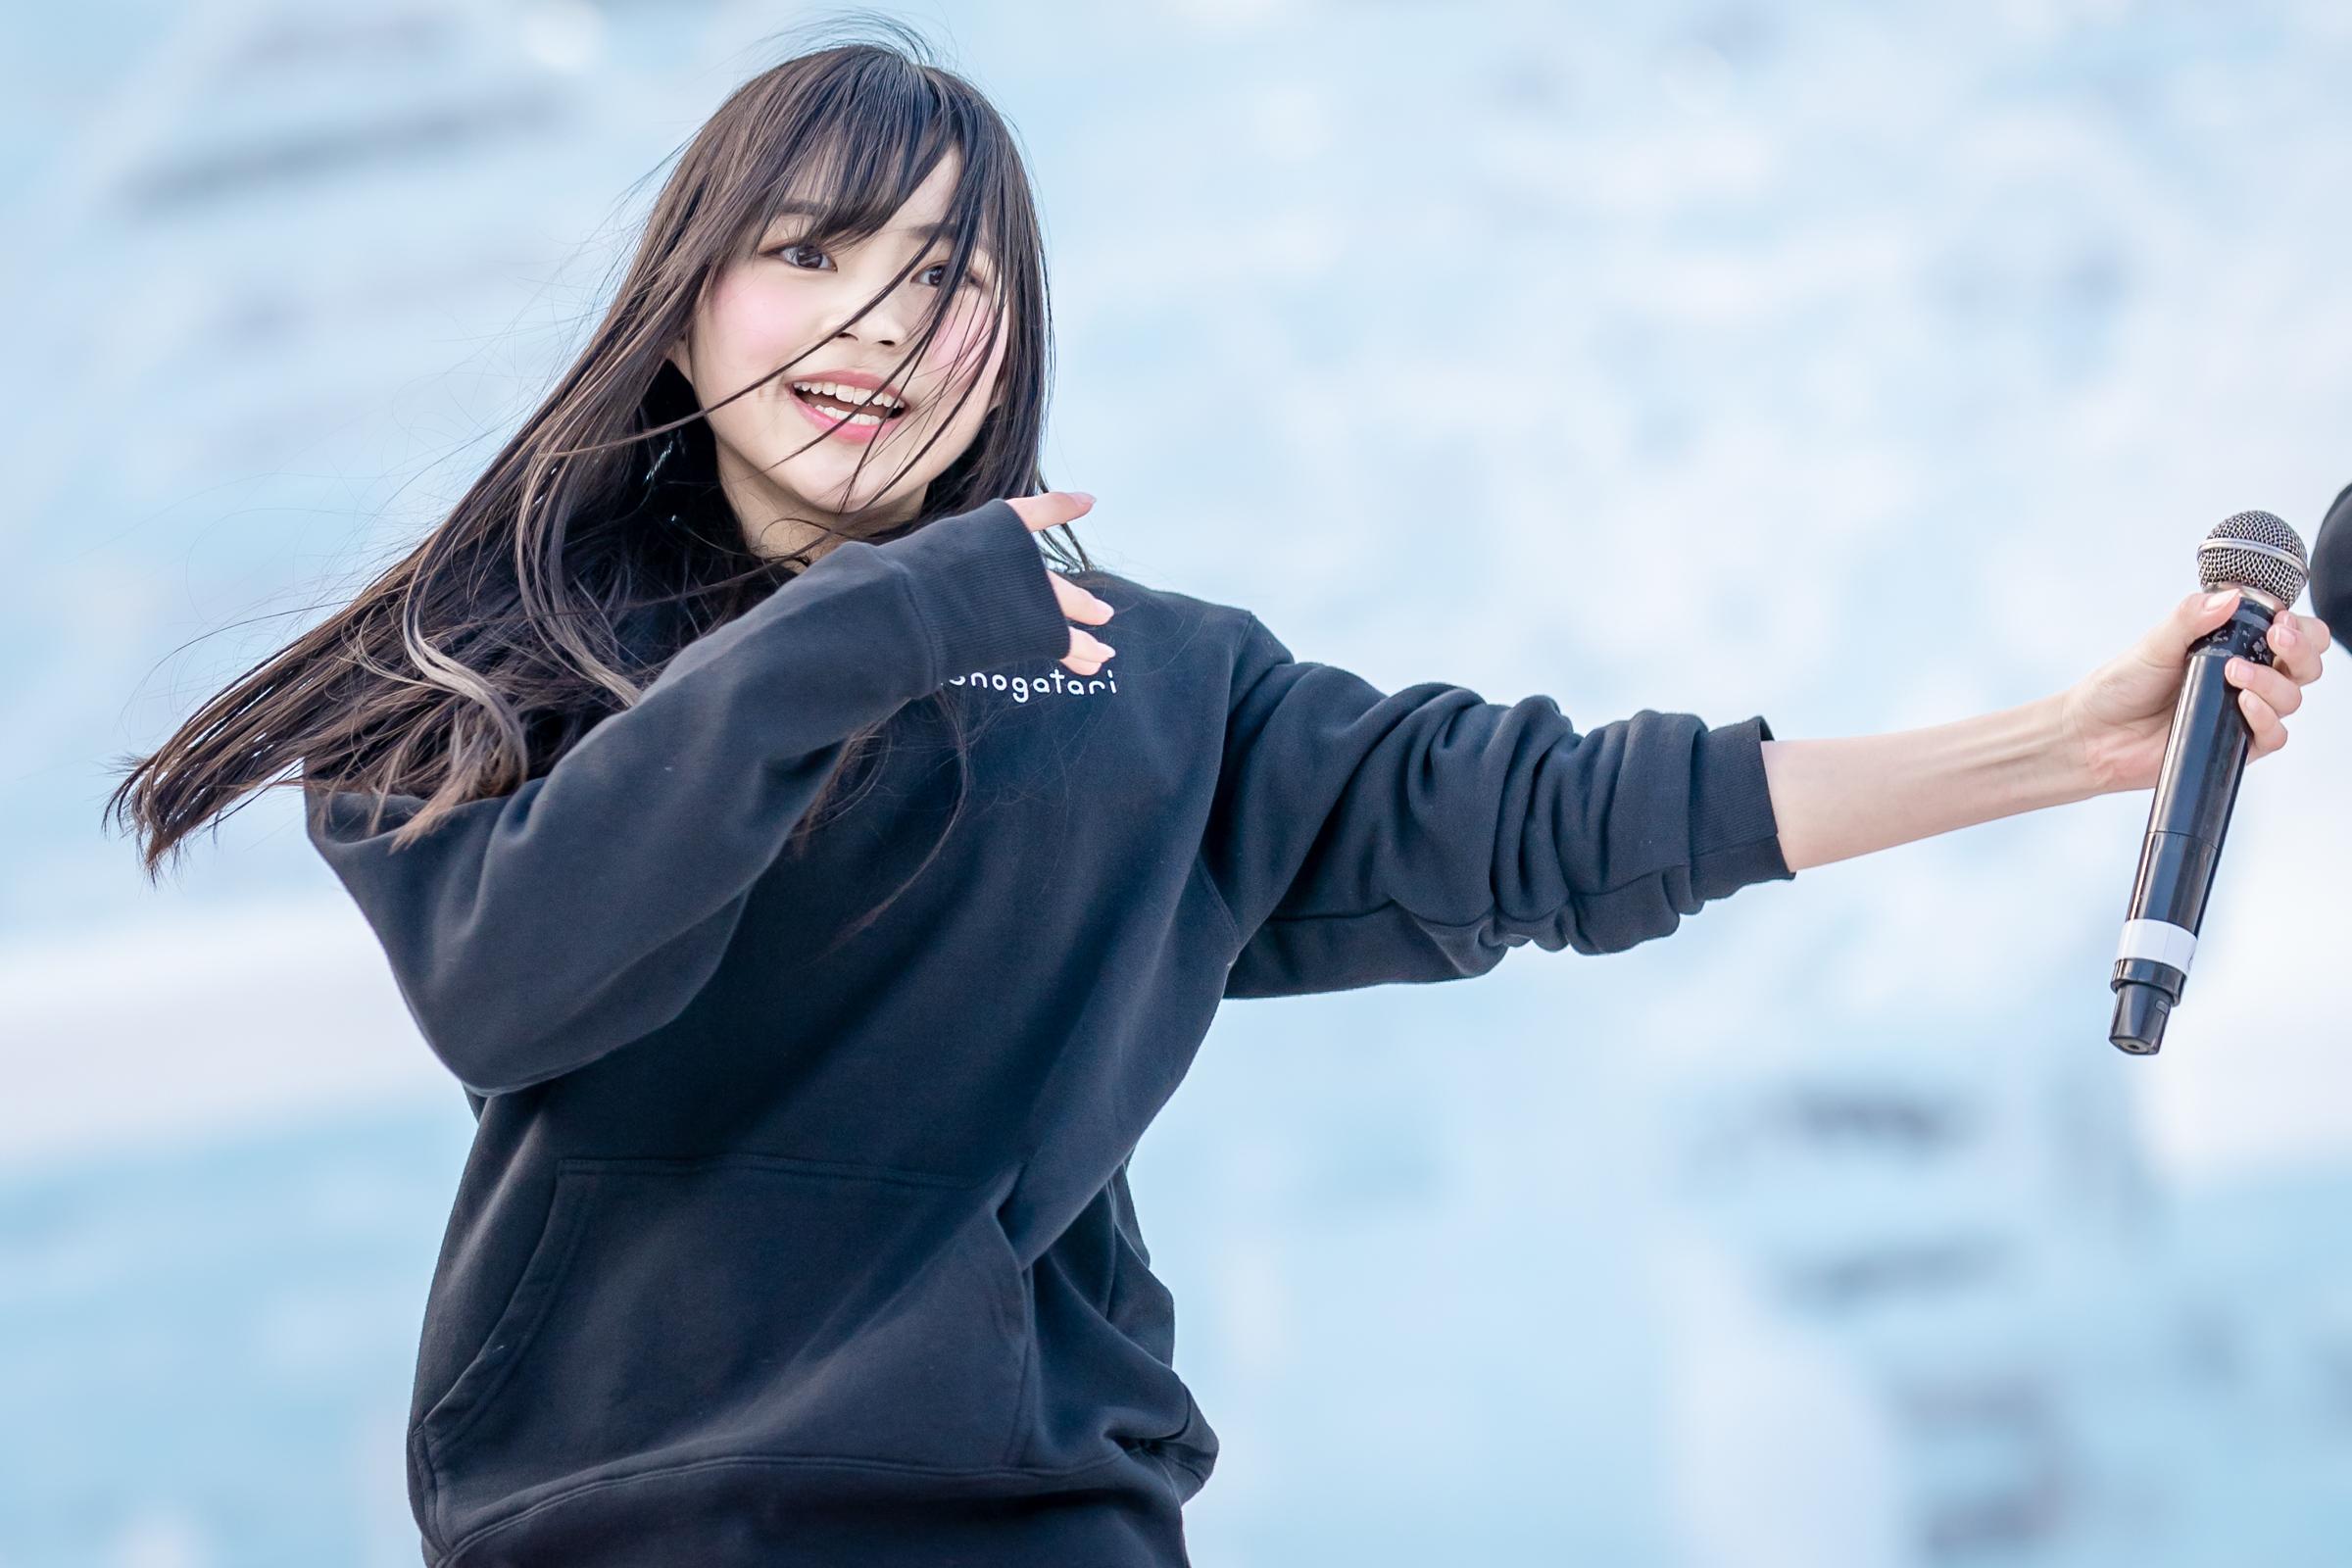 monogatari 柊宇咲